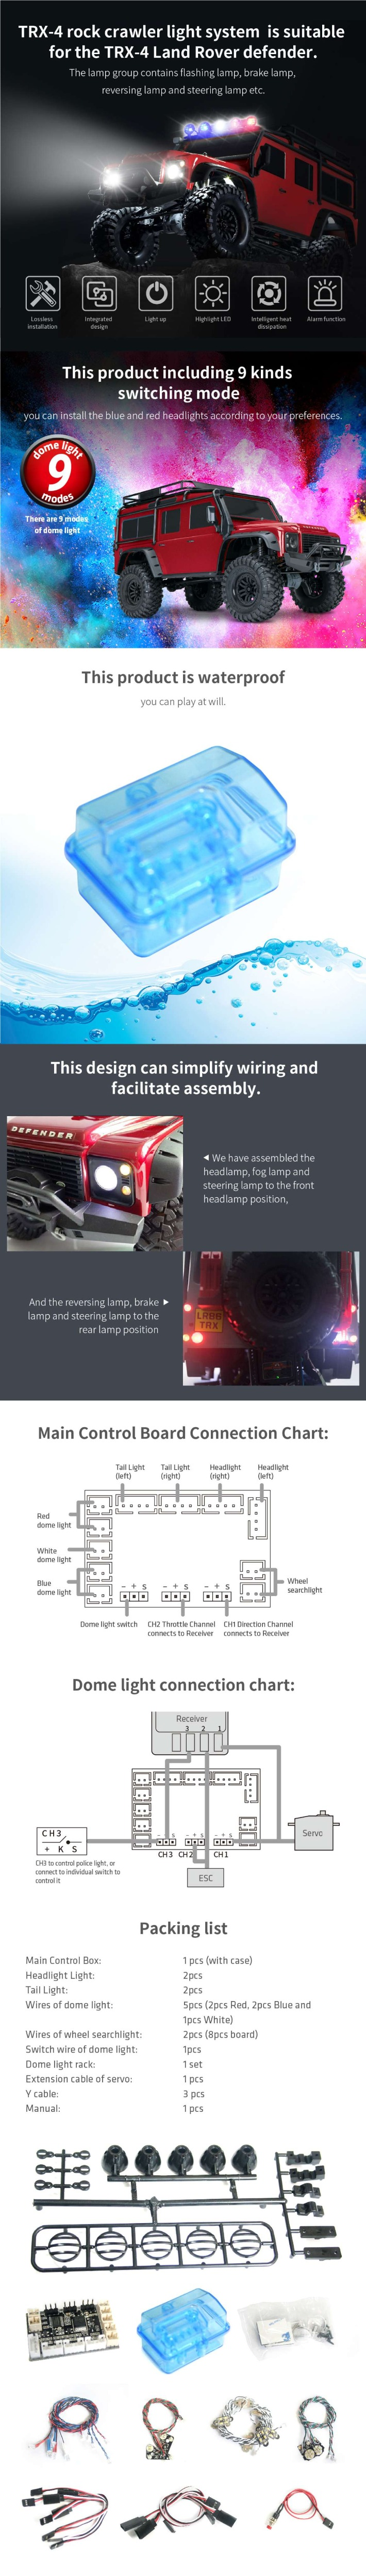 Gtpower подсветка для гусеницы рок подходит land rover defender